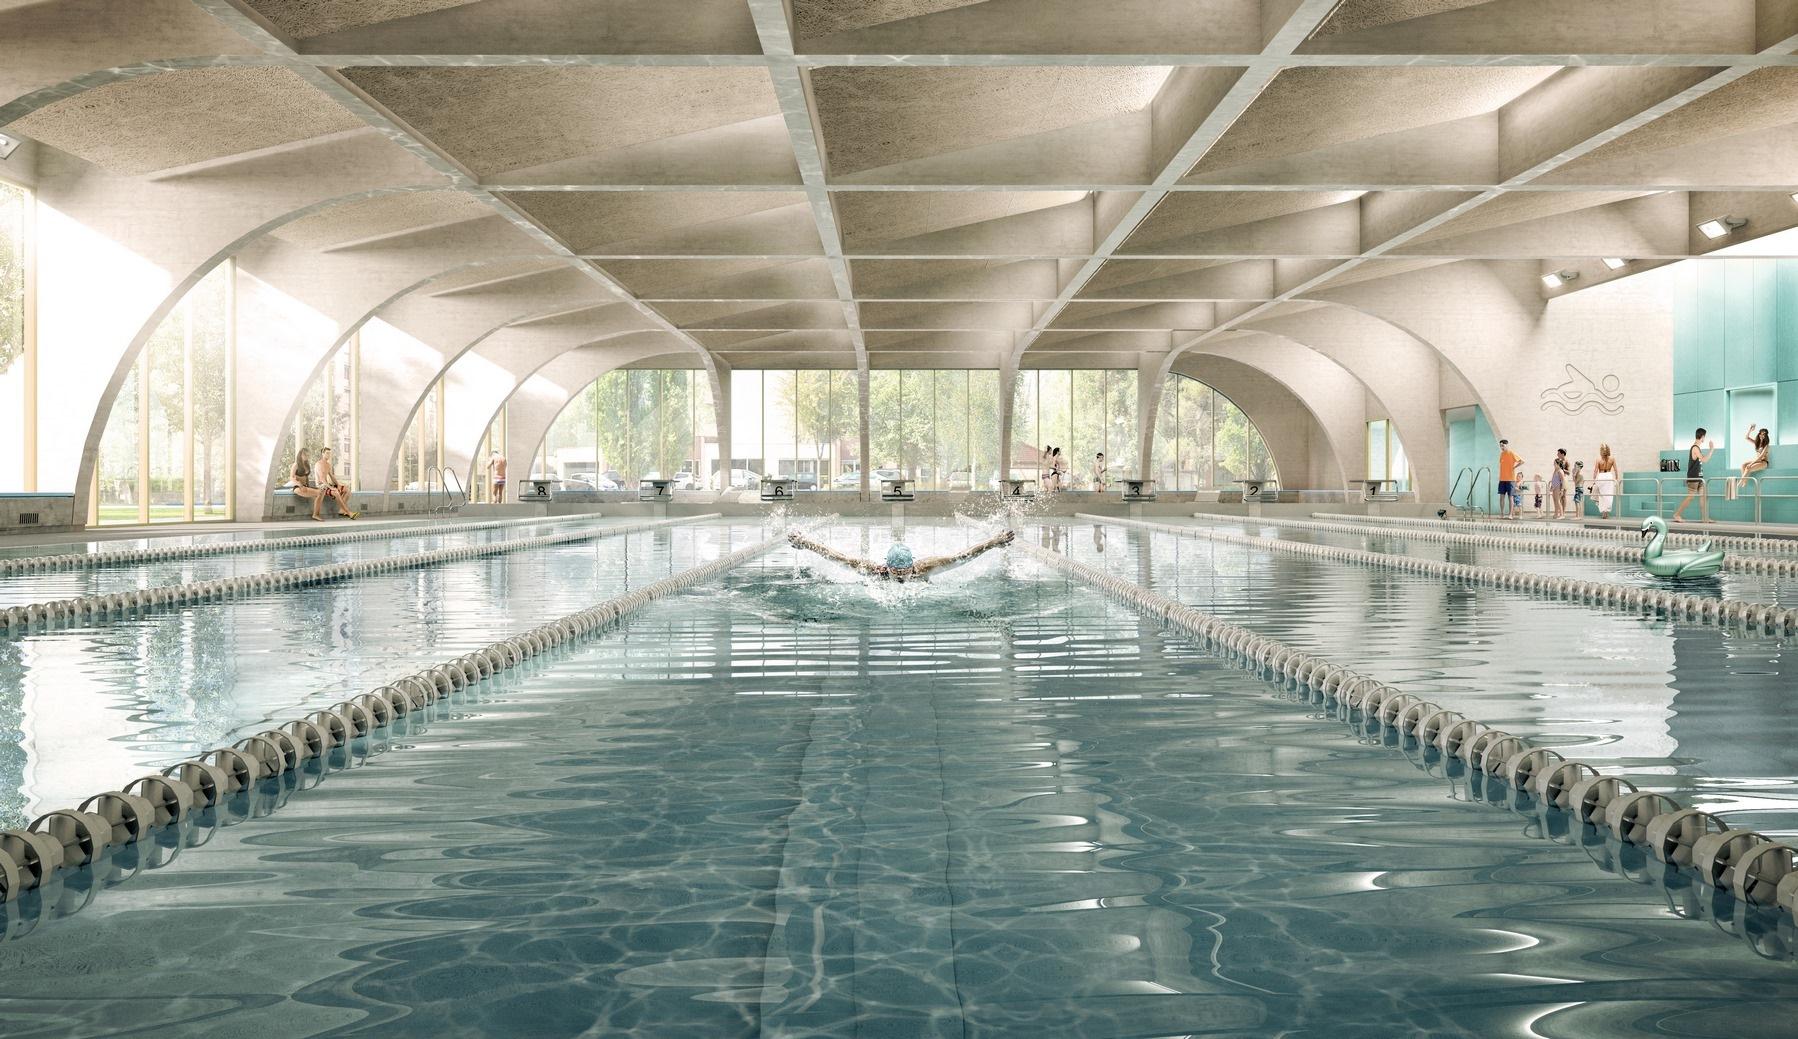 Piscine Bourgoin-Jallieu - Z Architecture